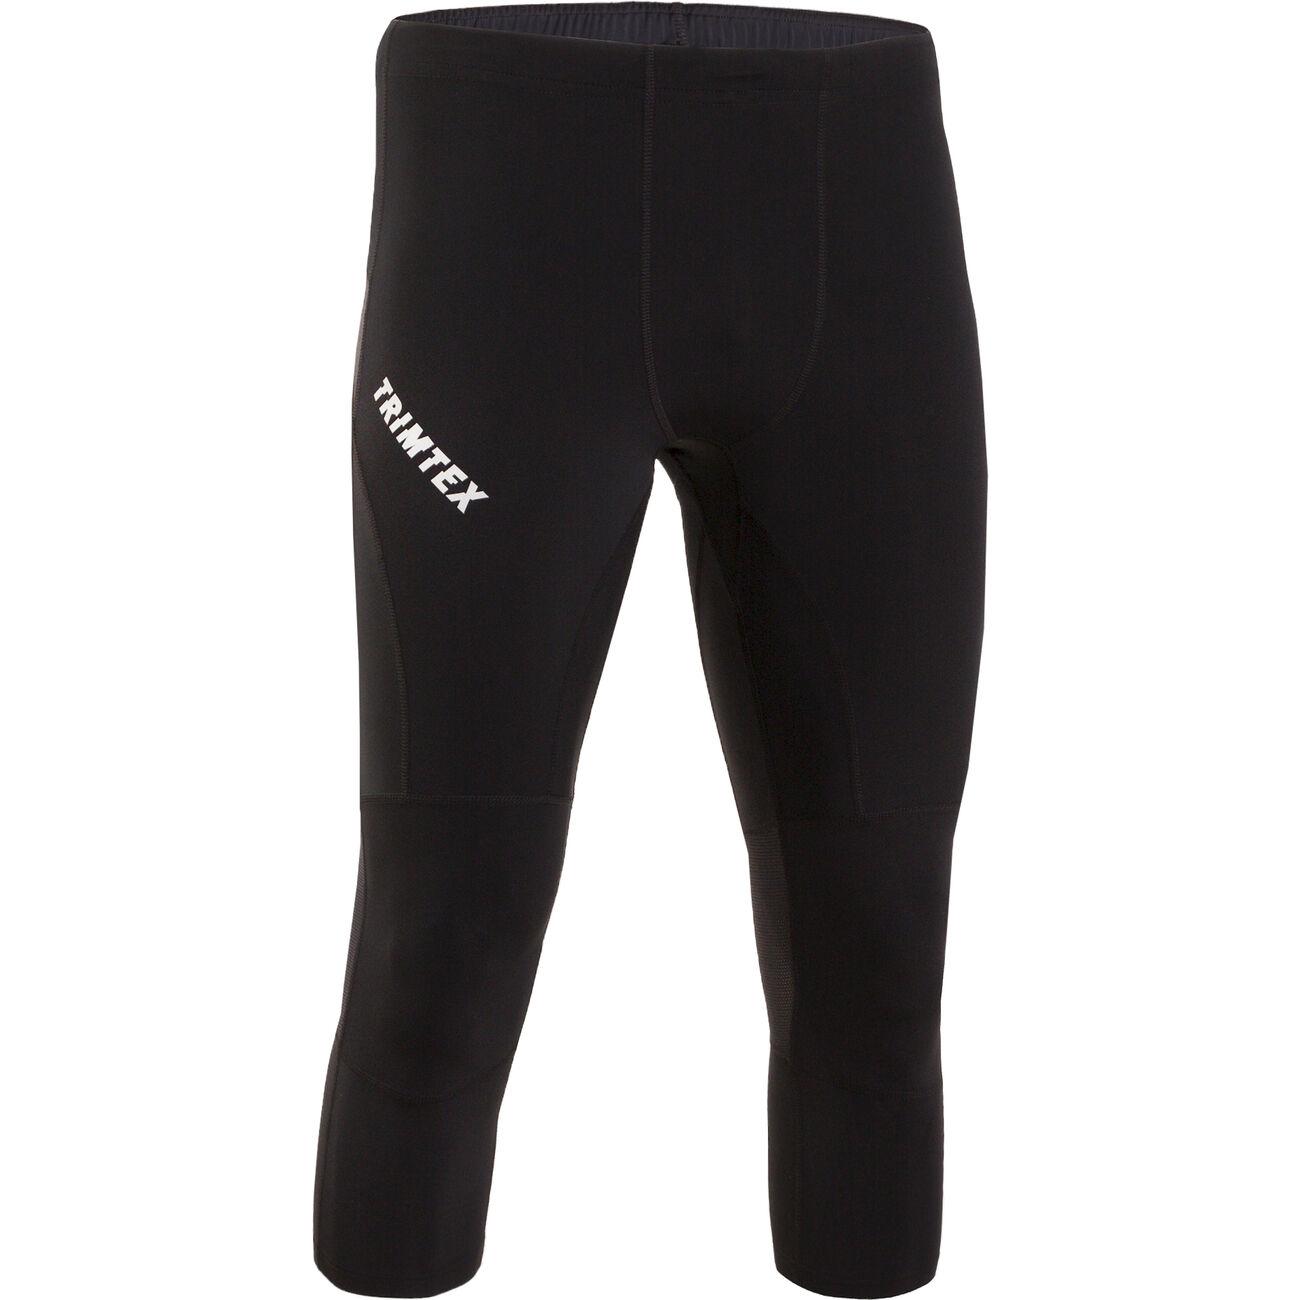 Compress 3/4 tights men's - Revised